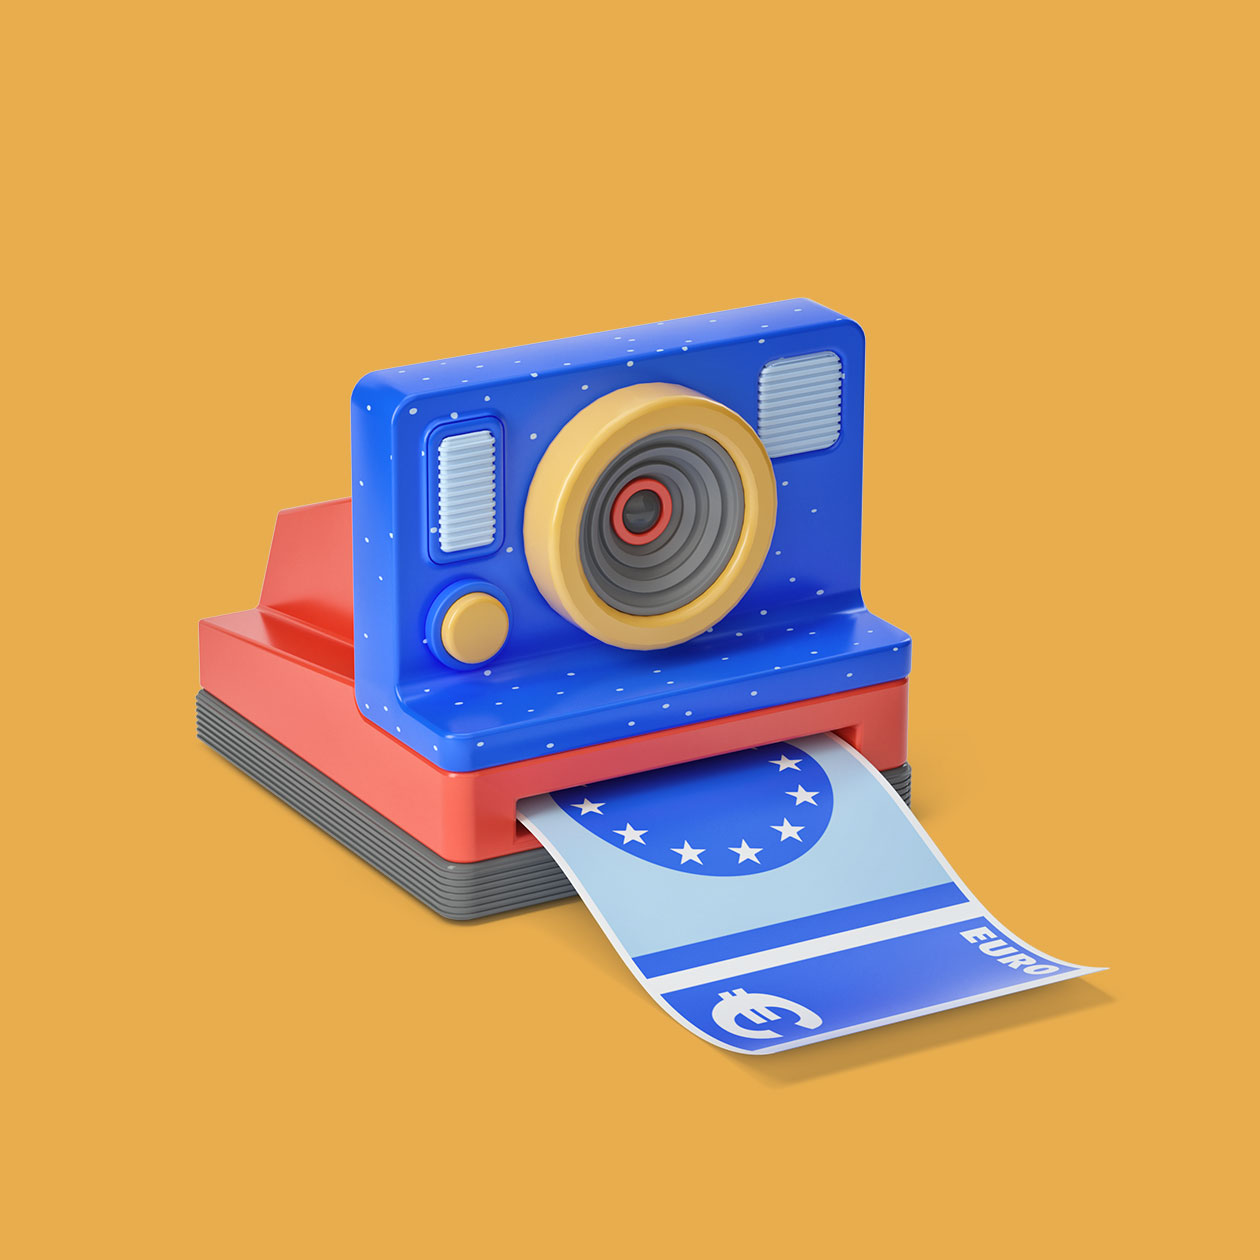 foreal_wakam_polaroid